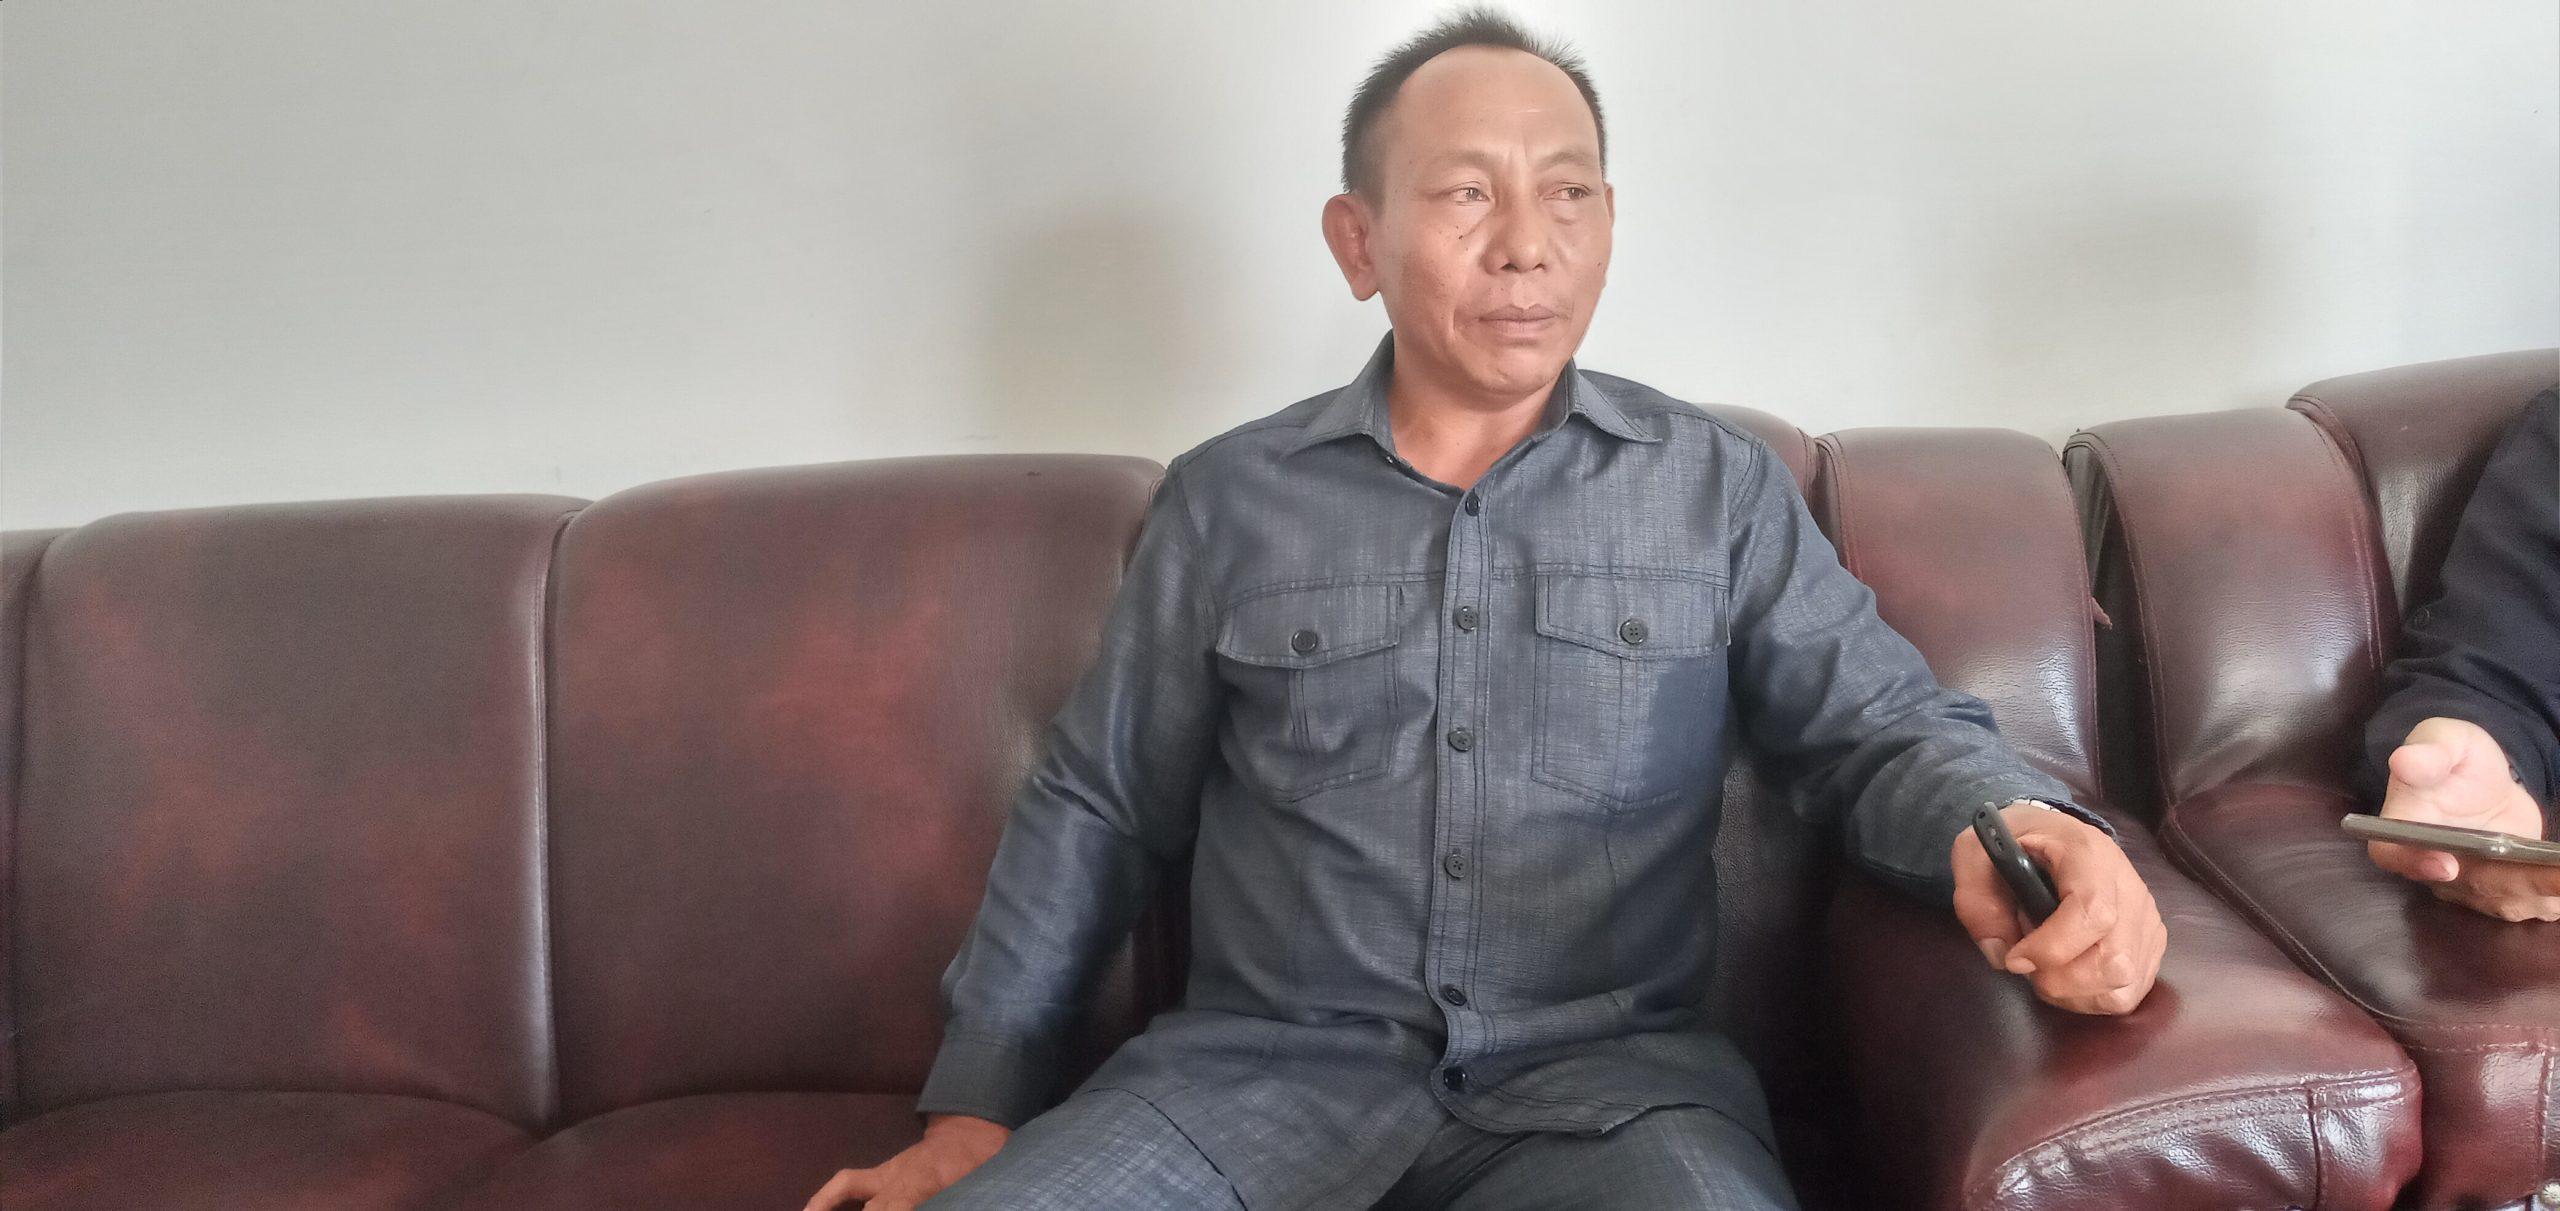 Ketua DPC PDIP Kabupaten Konawe Utara, I Made Tarubuana. Foto: Mumun/Mediakendari.com